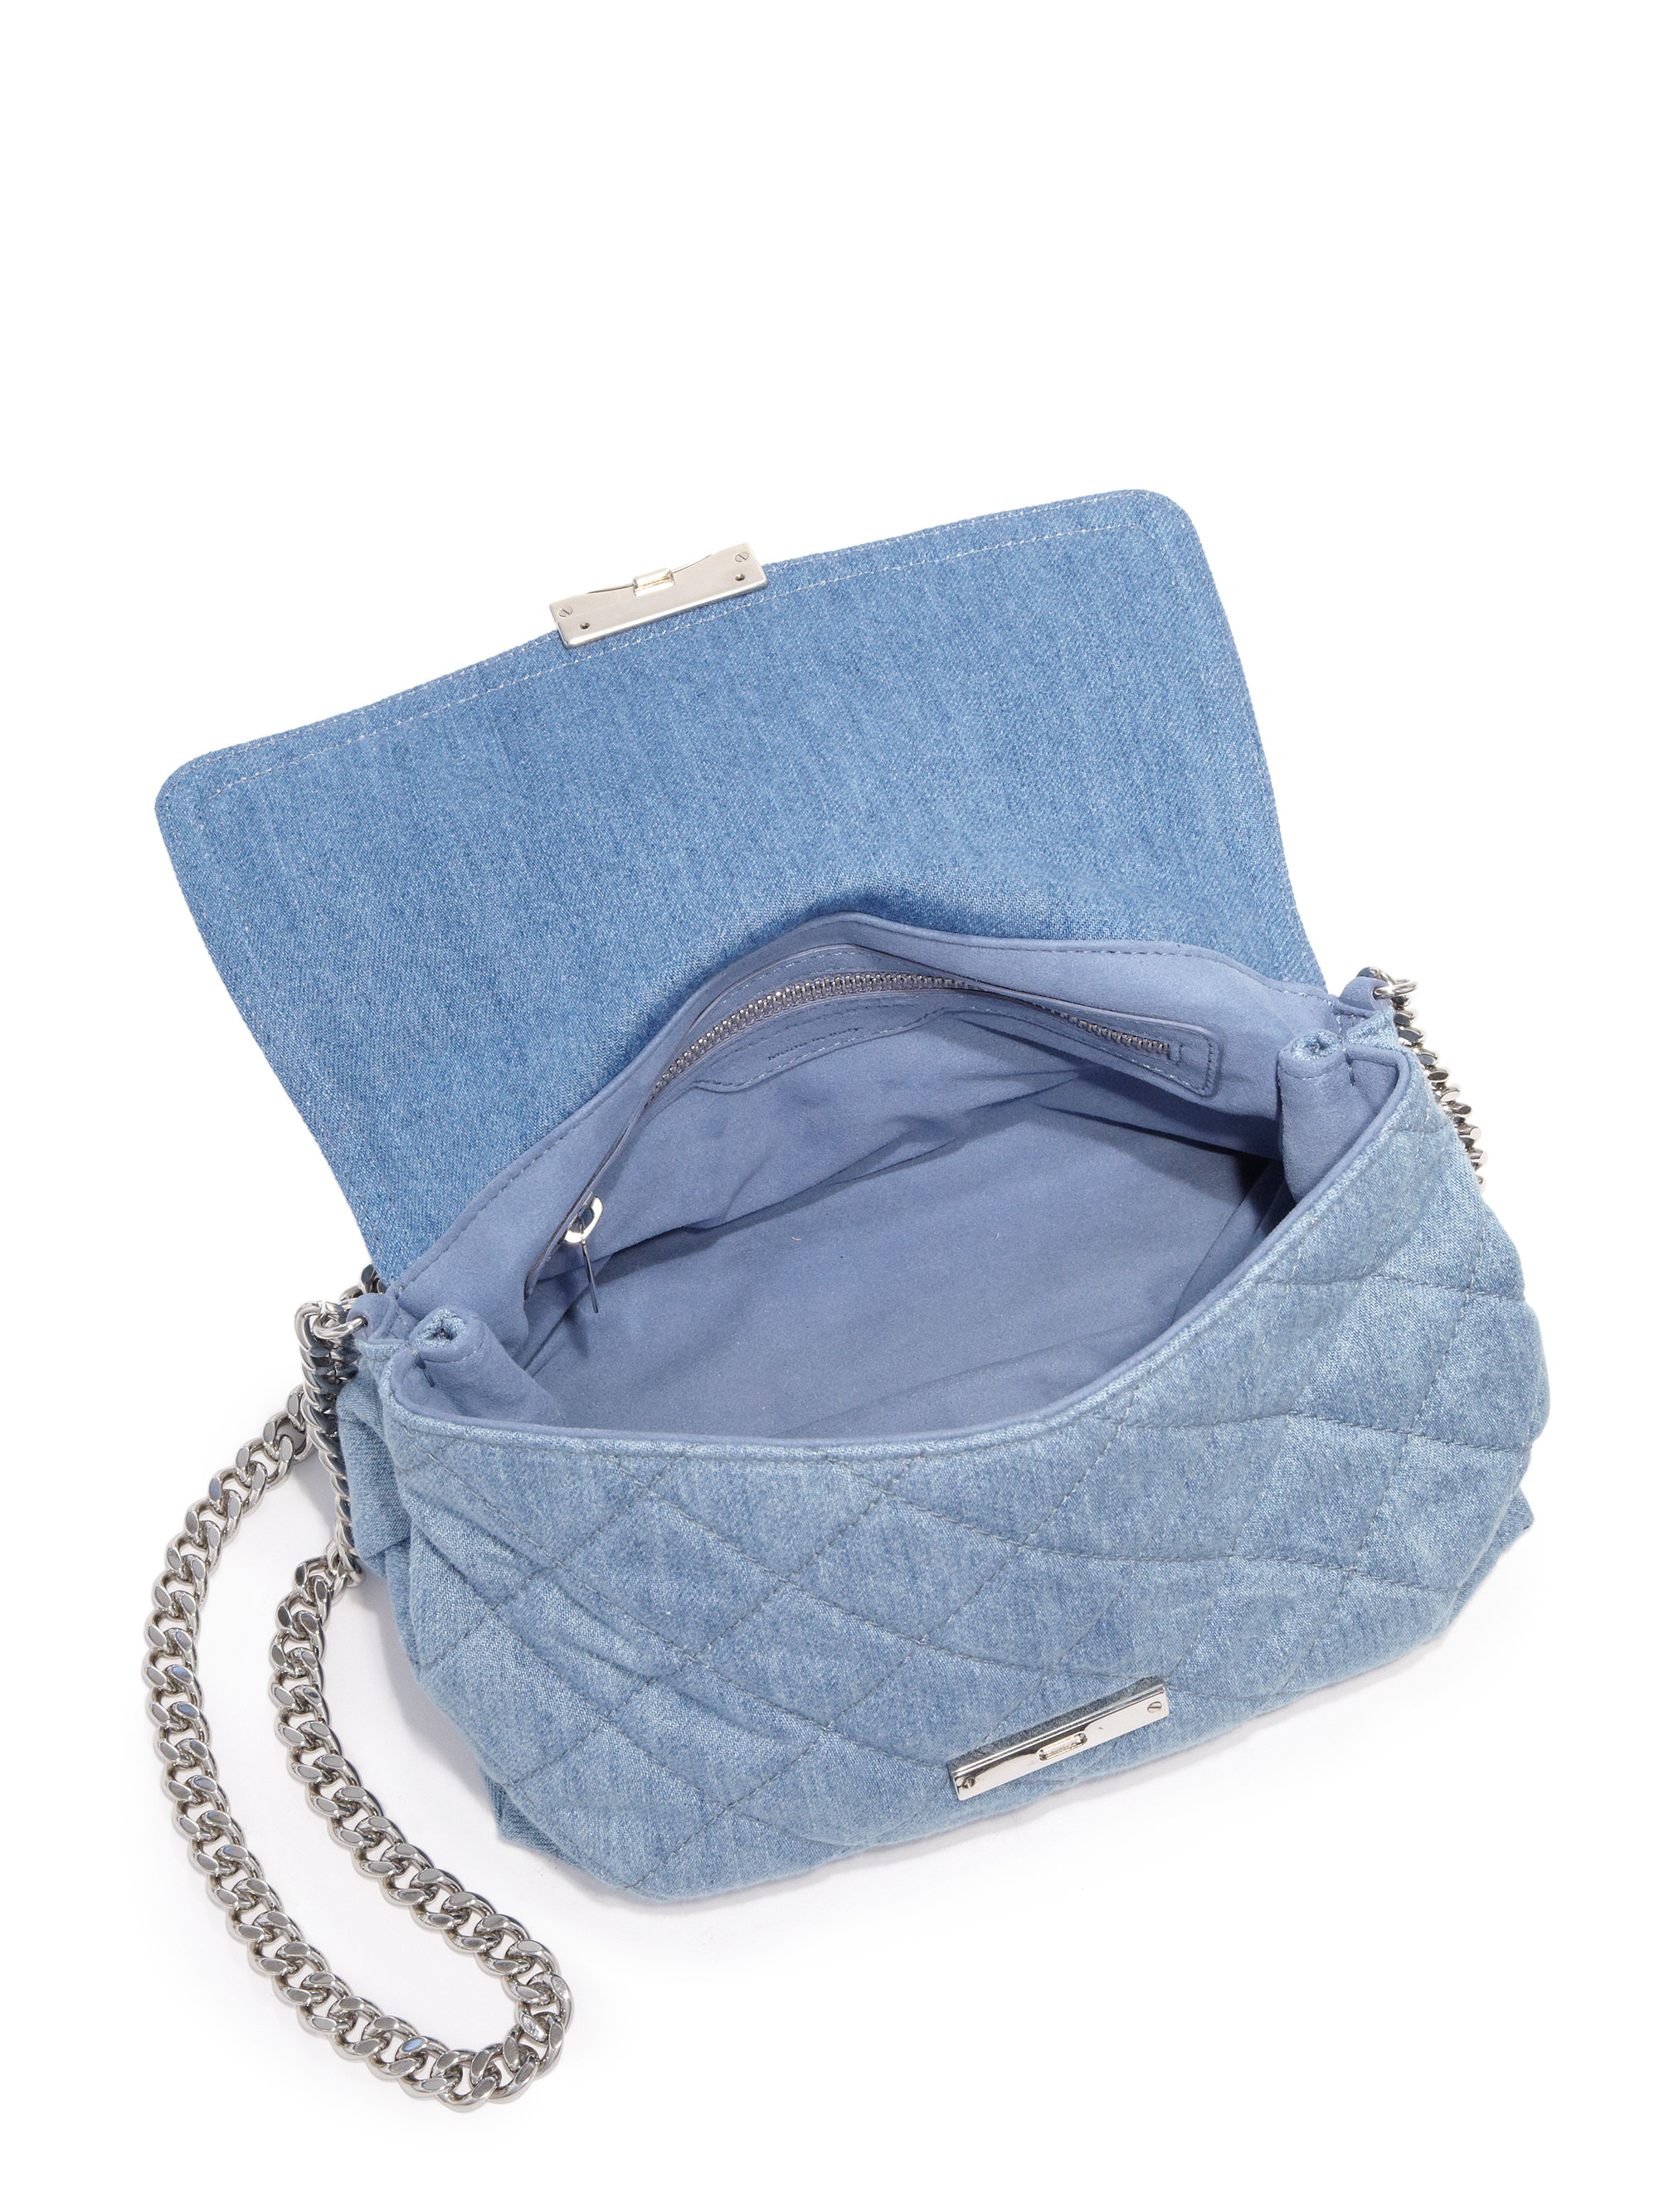 f92b57166d49 Lyst - Stella McCartney Soft Beckett Quilted Denim Shoulder Bag in Blue